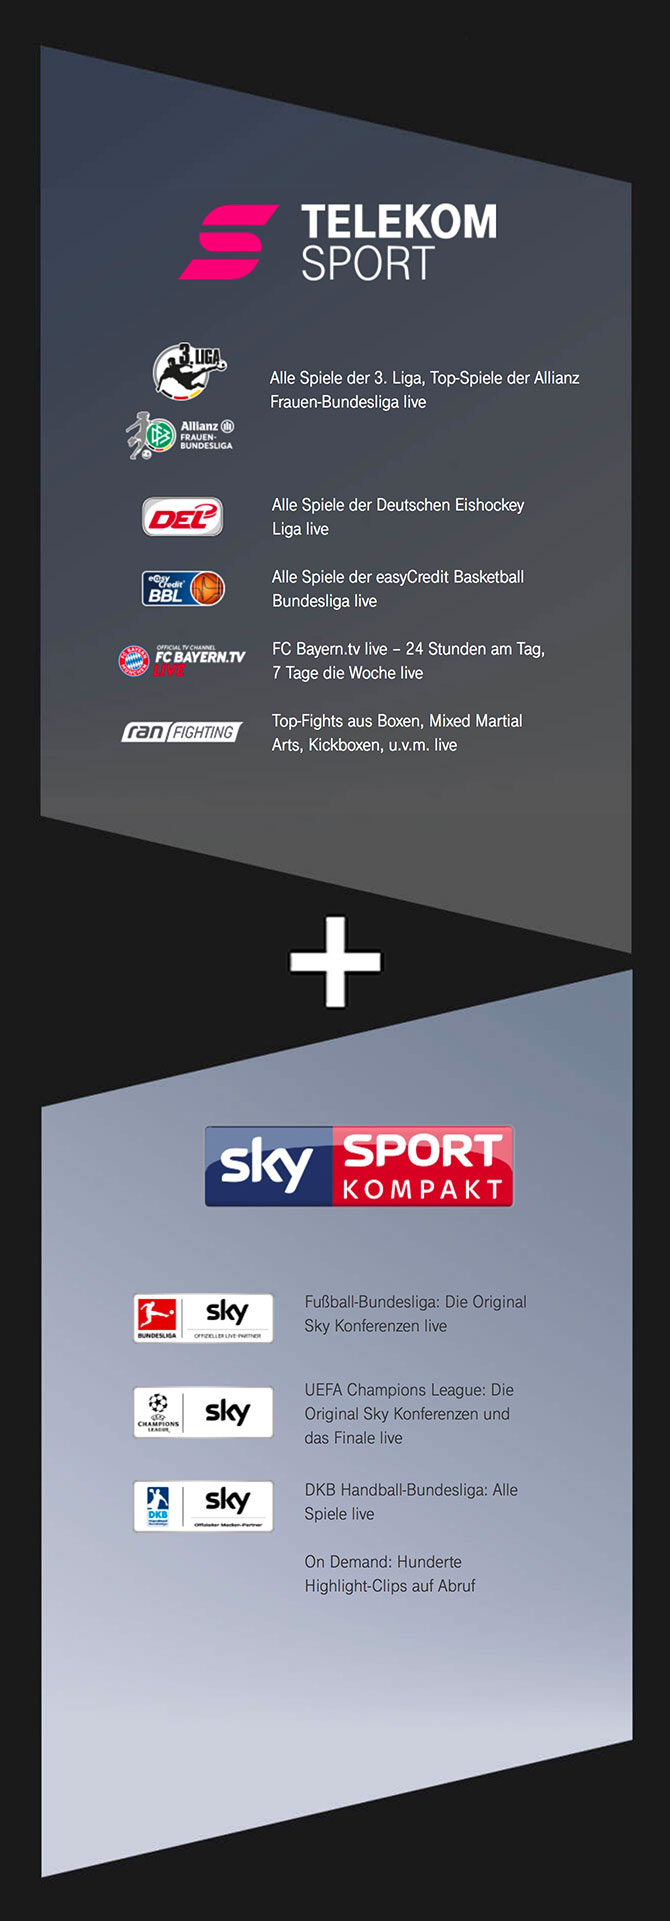 Telekom Sportpaket mit Sky Sport Kompakt